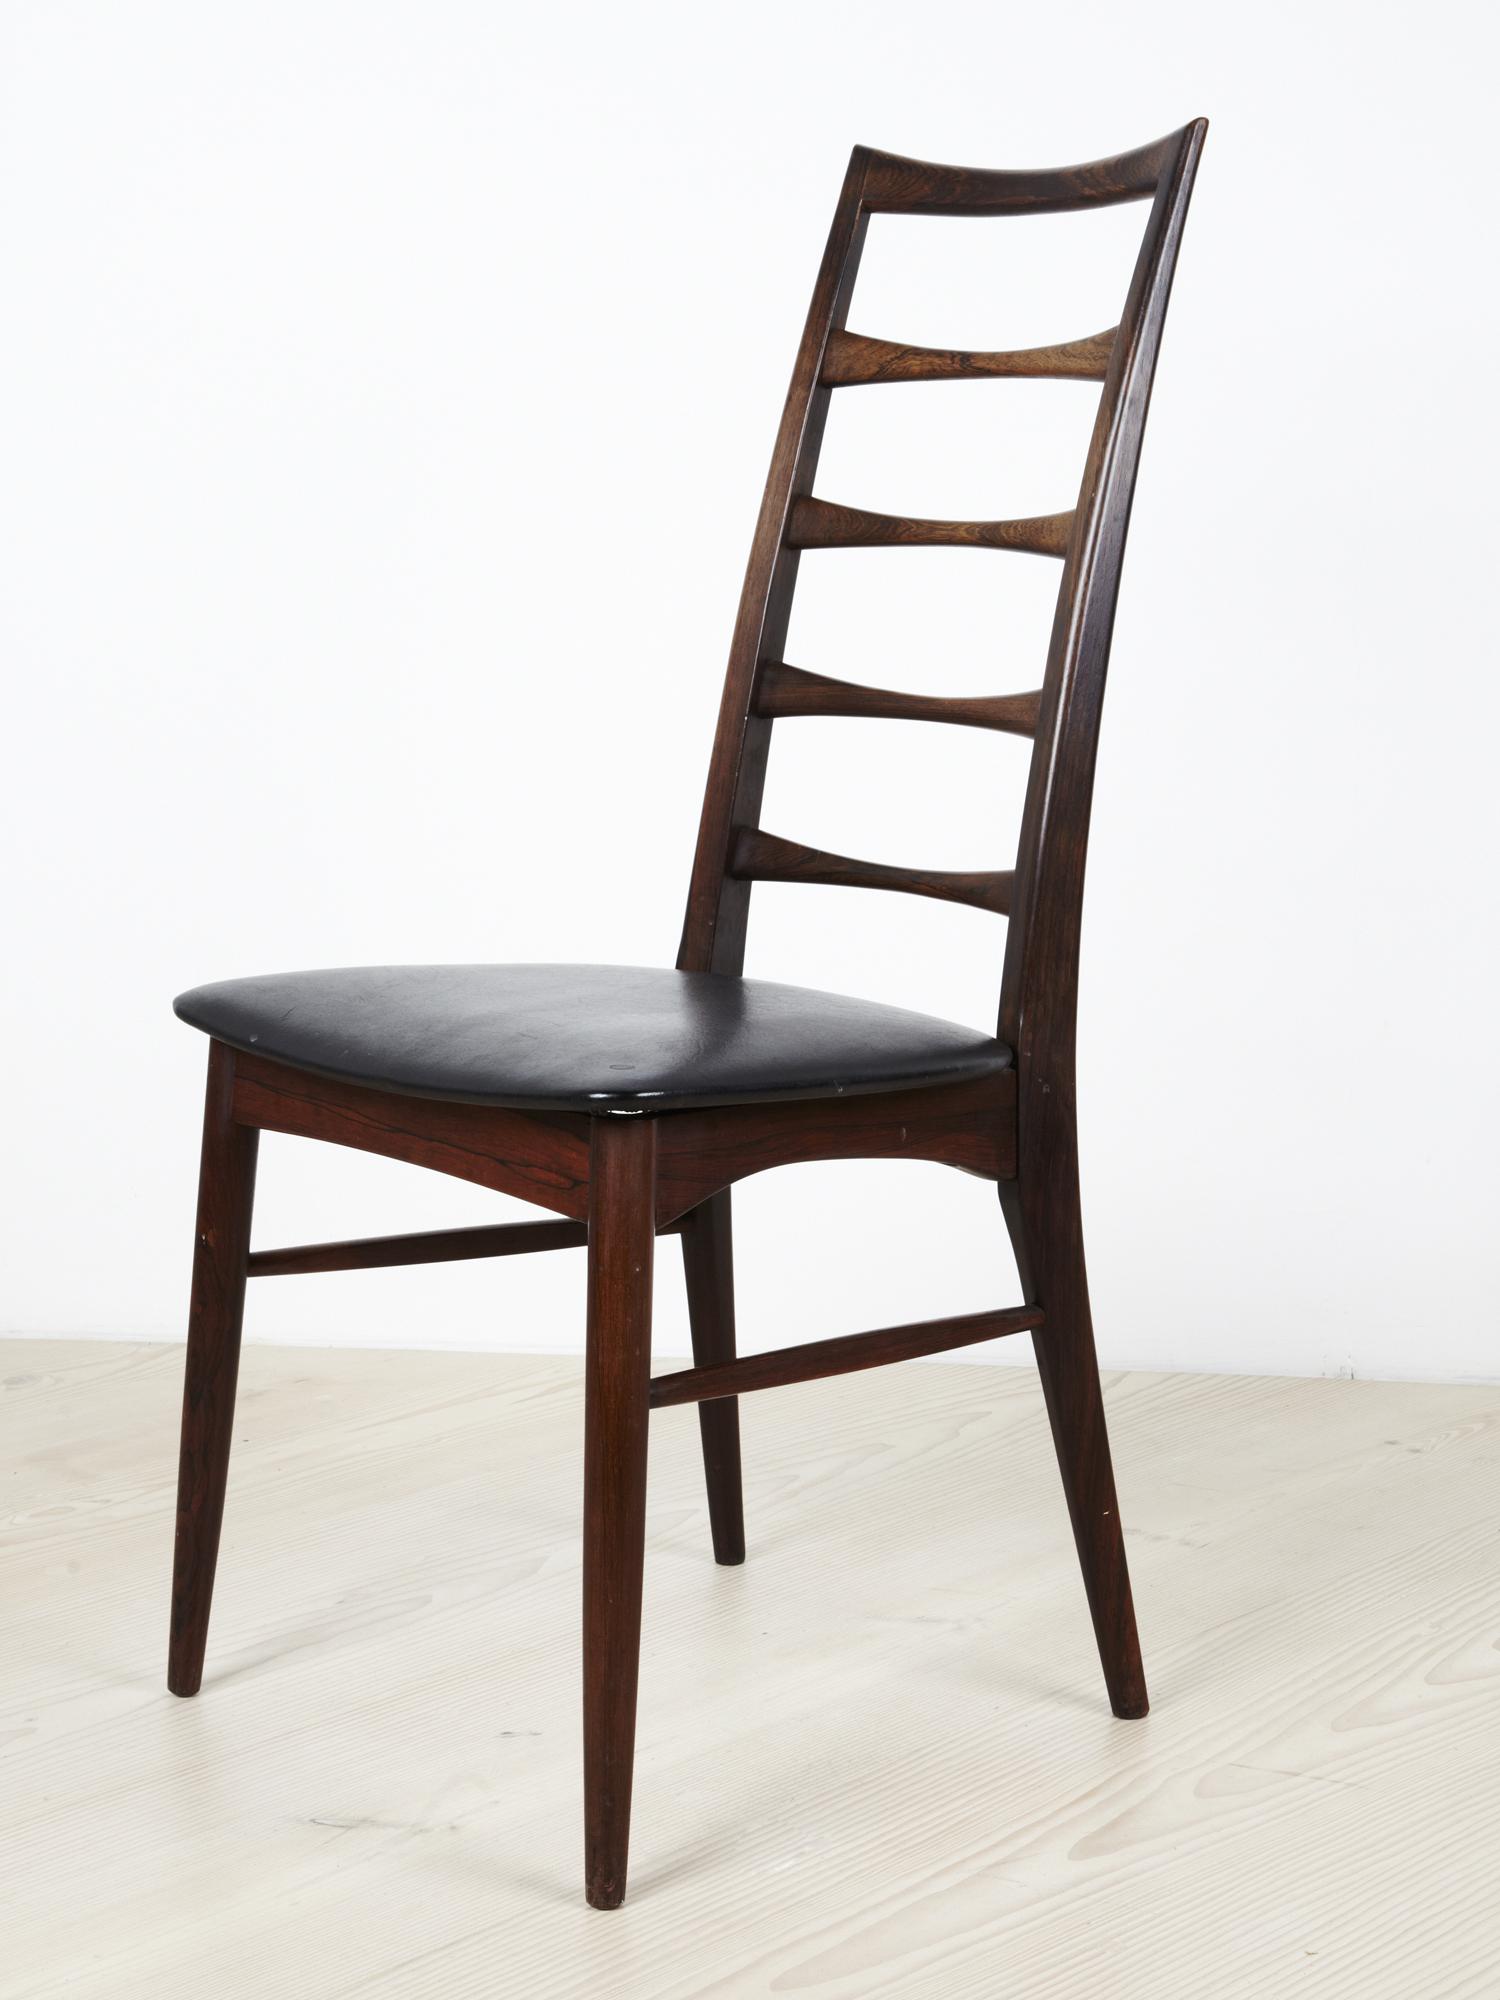 N Kofoed 1964 Ladderback Dining Chair   • made 1964-69    •